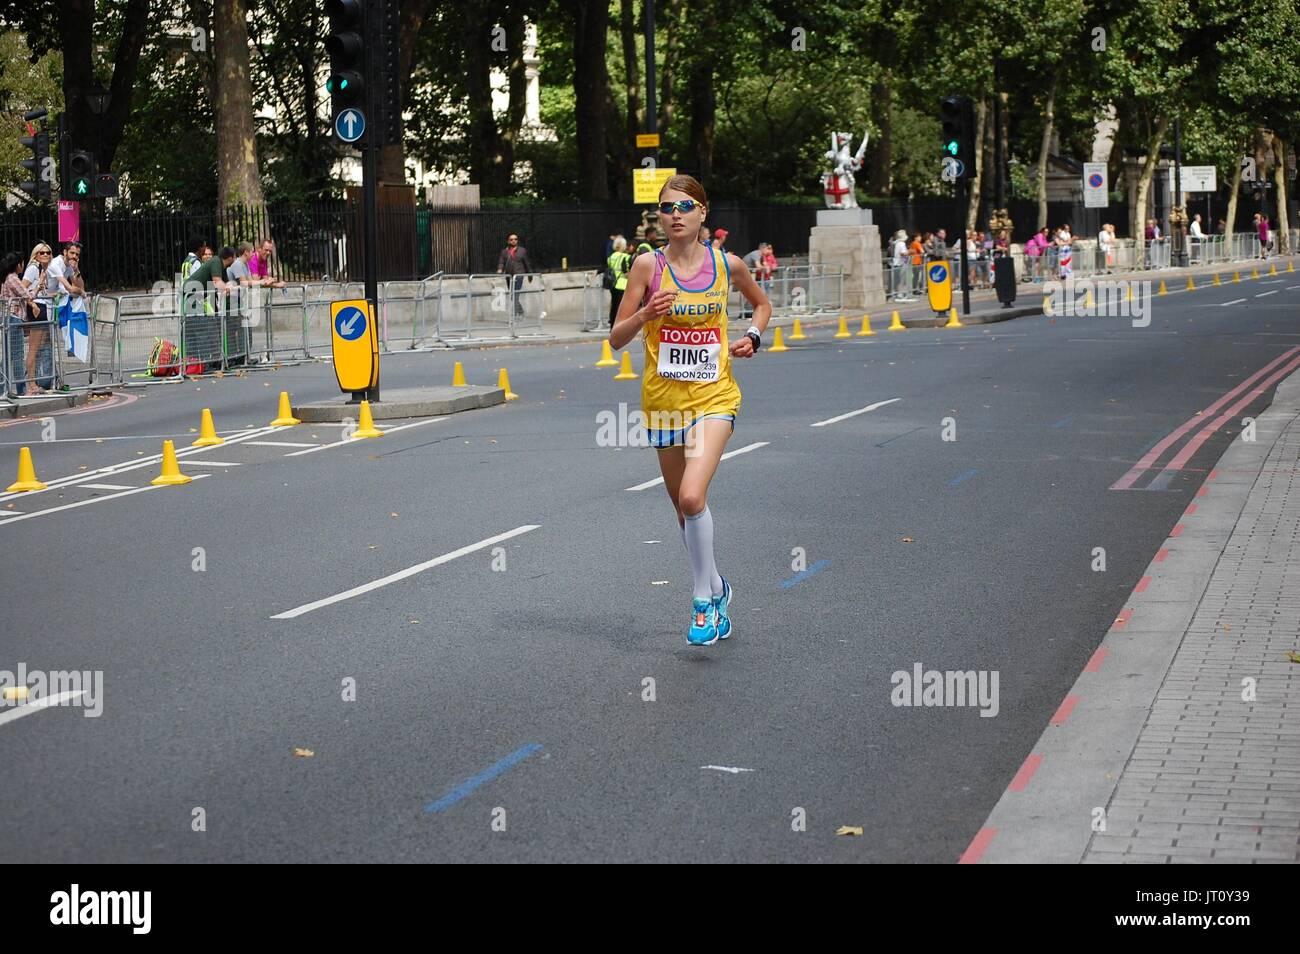 London, UK. 6. August 2017. IAAF World Championships 2017 London Women Marathon Ring Credit: Justas Balciunas/Alamy Live-Nachrichten Stockbild